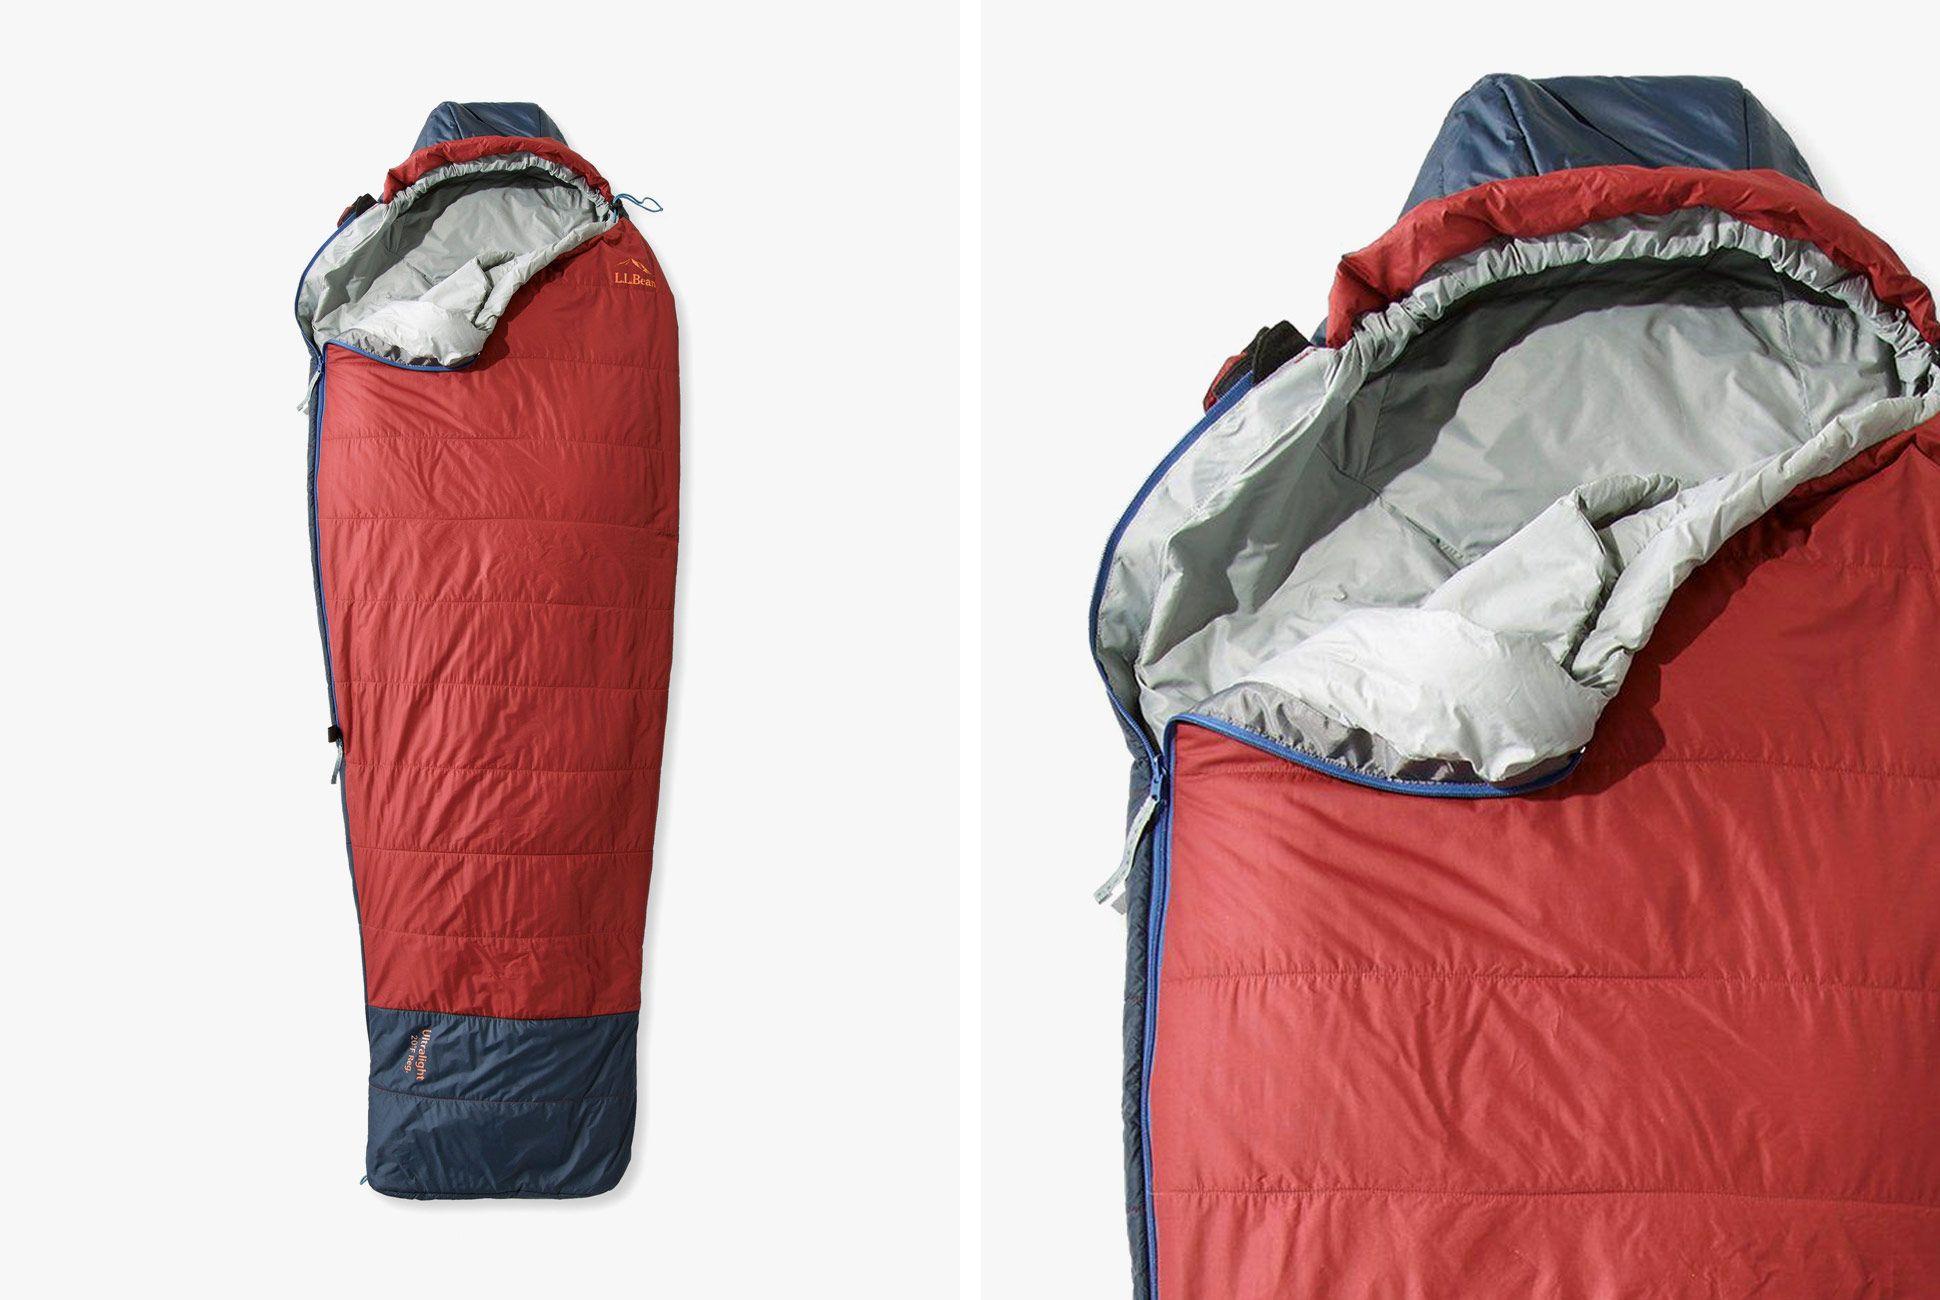 L Bean Ultralight Sleeping Bag Uses E Insulation